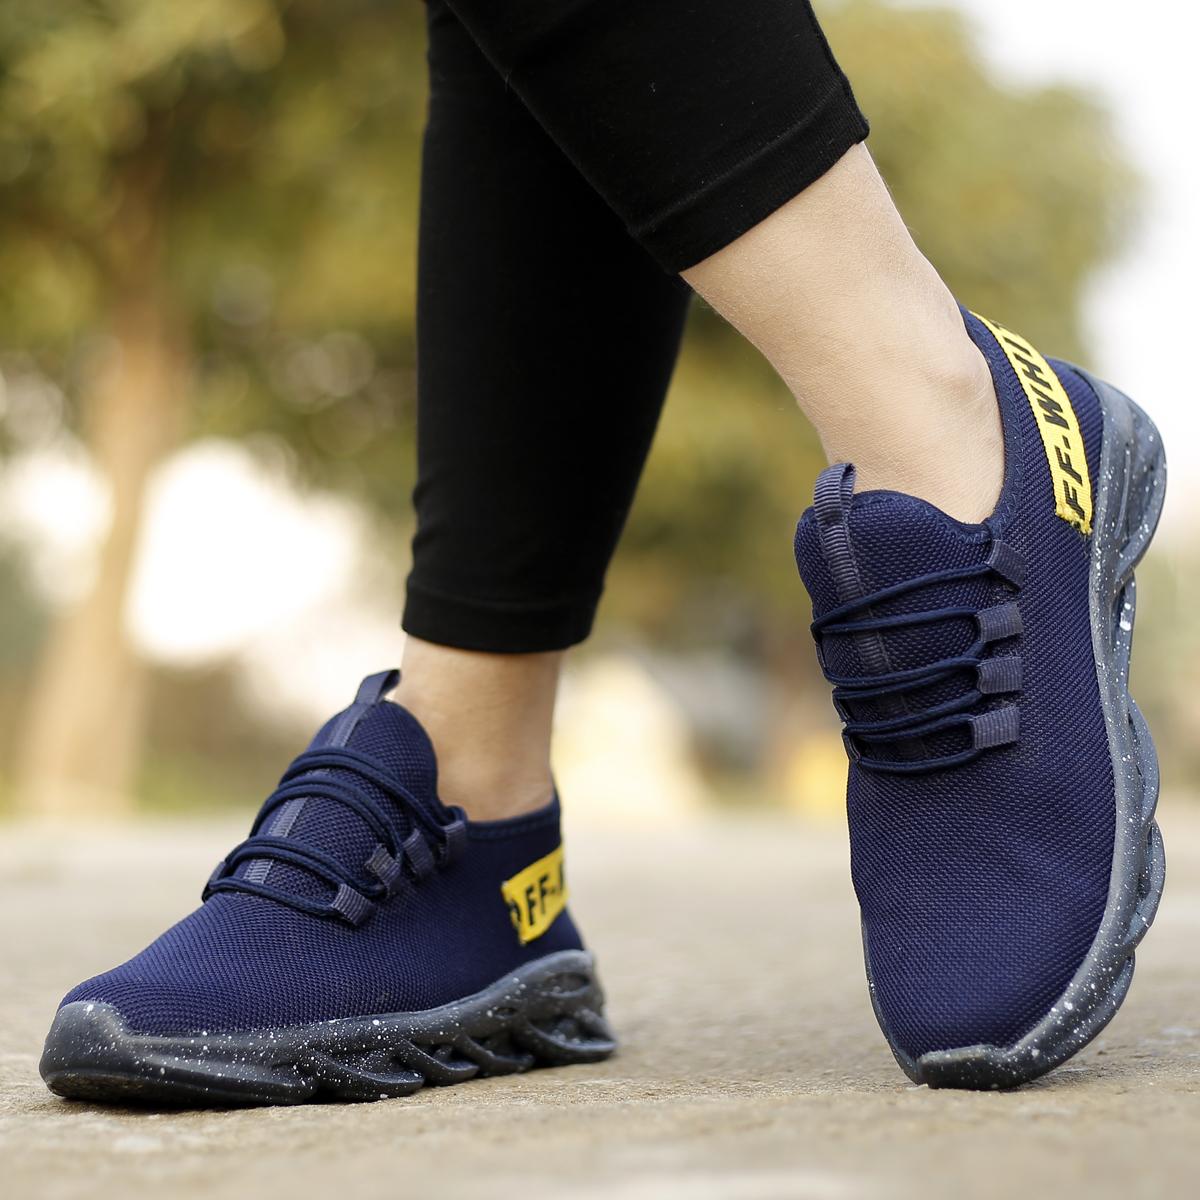 High Fashion Sports Shoes